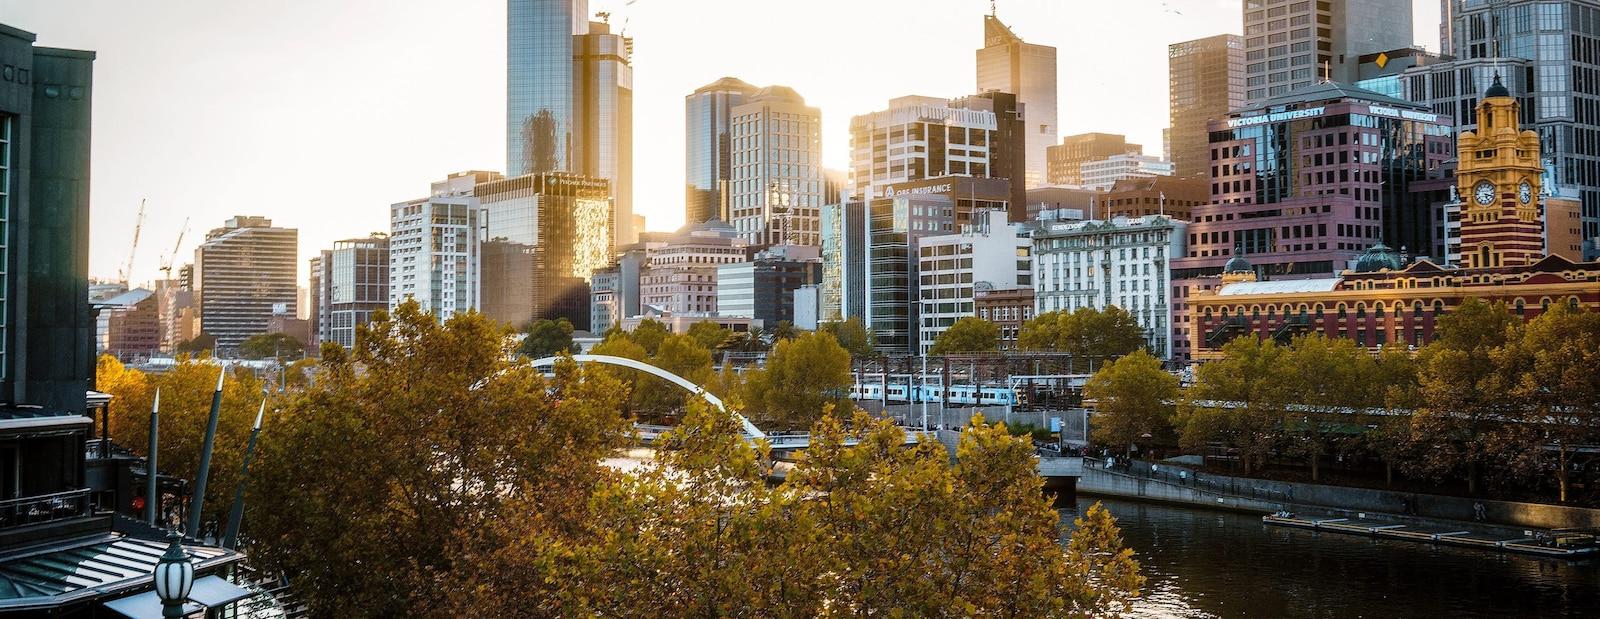 Melbourne City的度假屋